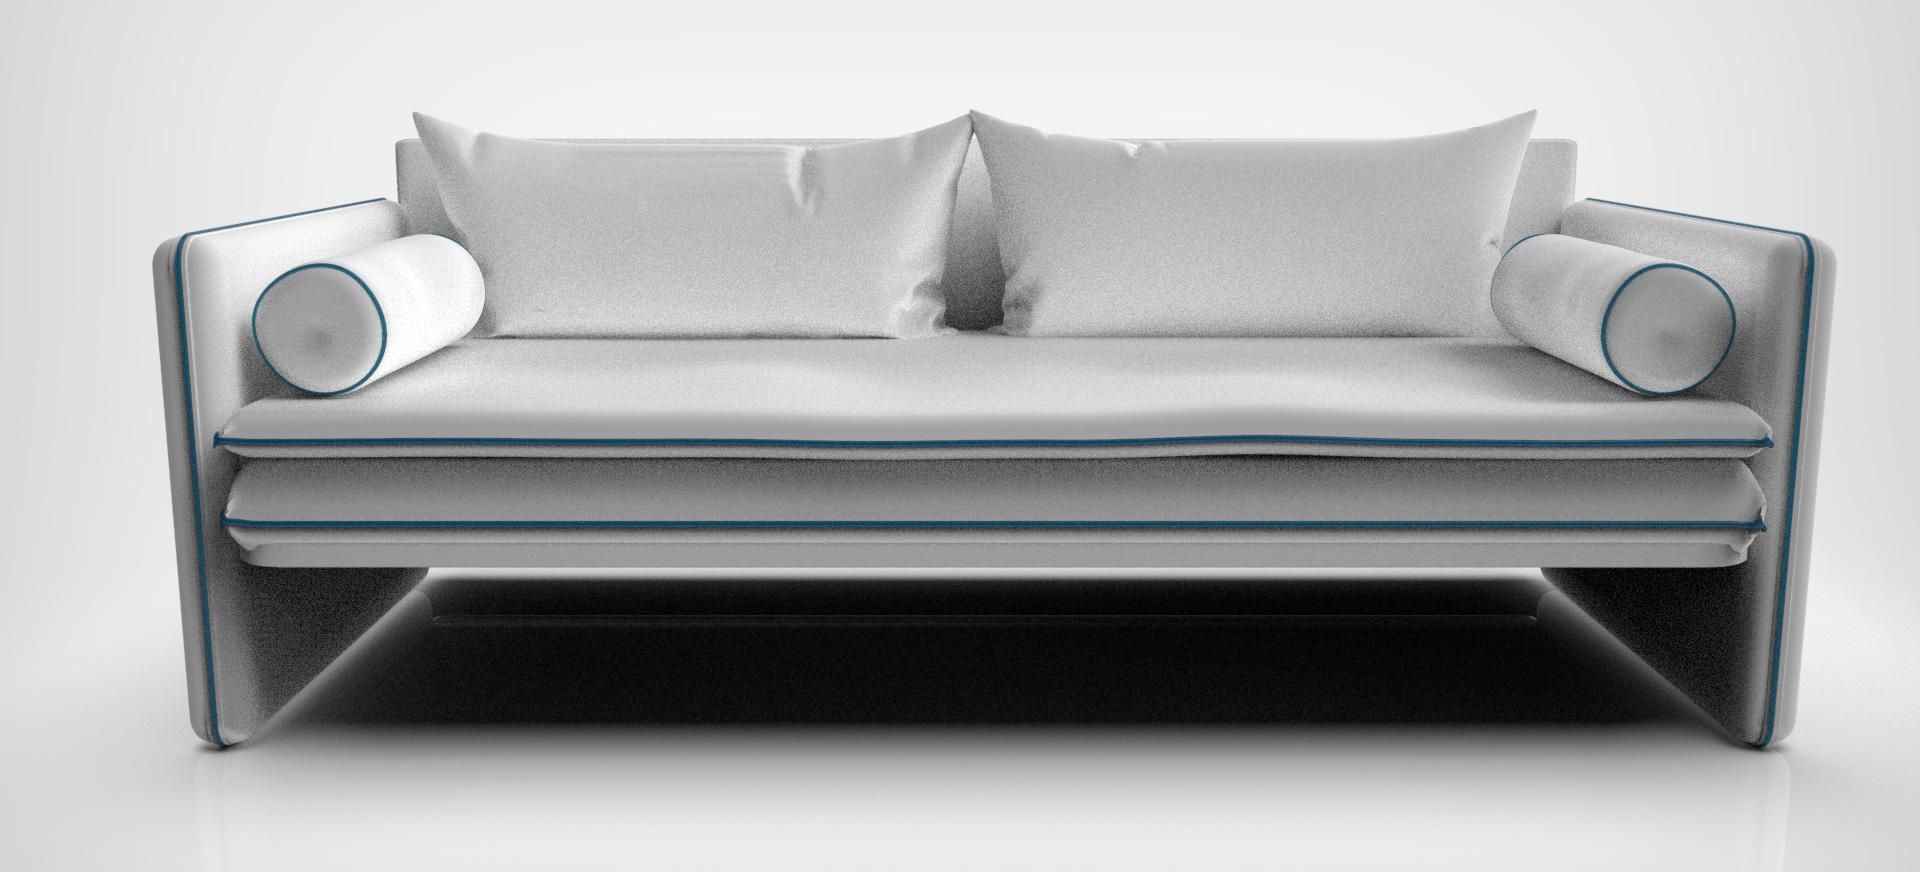 muebles-amha-sofa-manressa.jpg